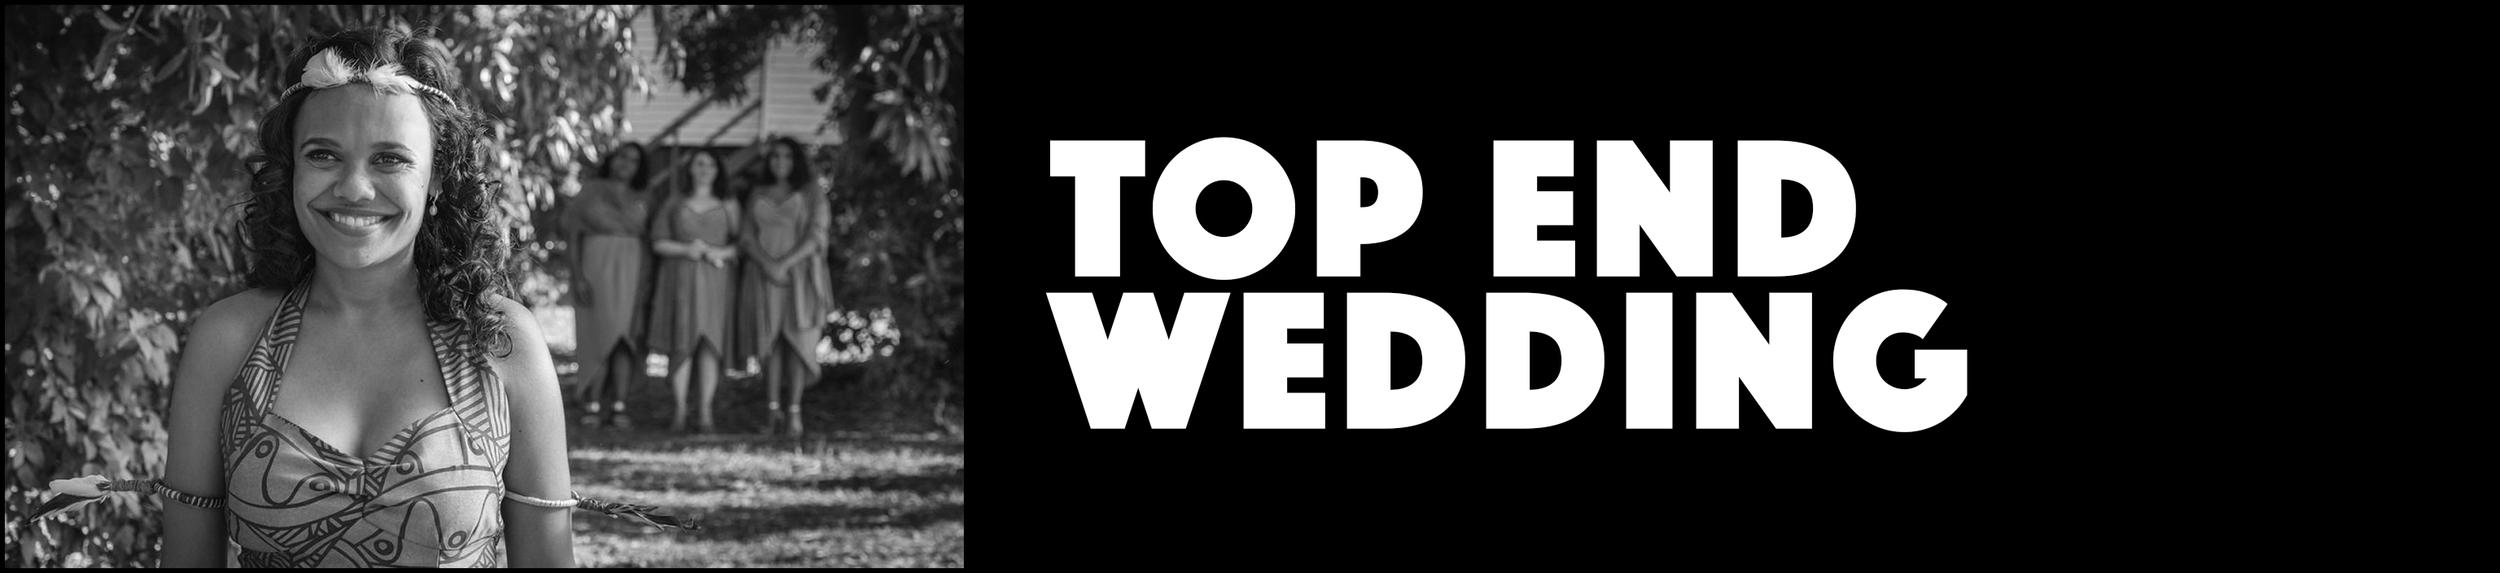 Top End Wedding.png